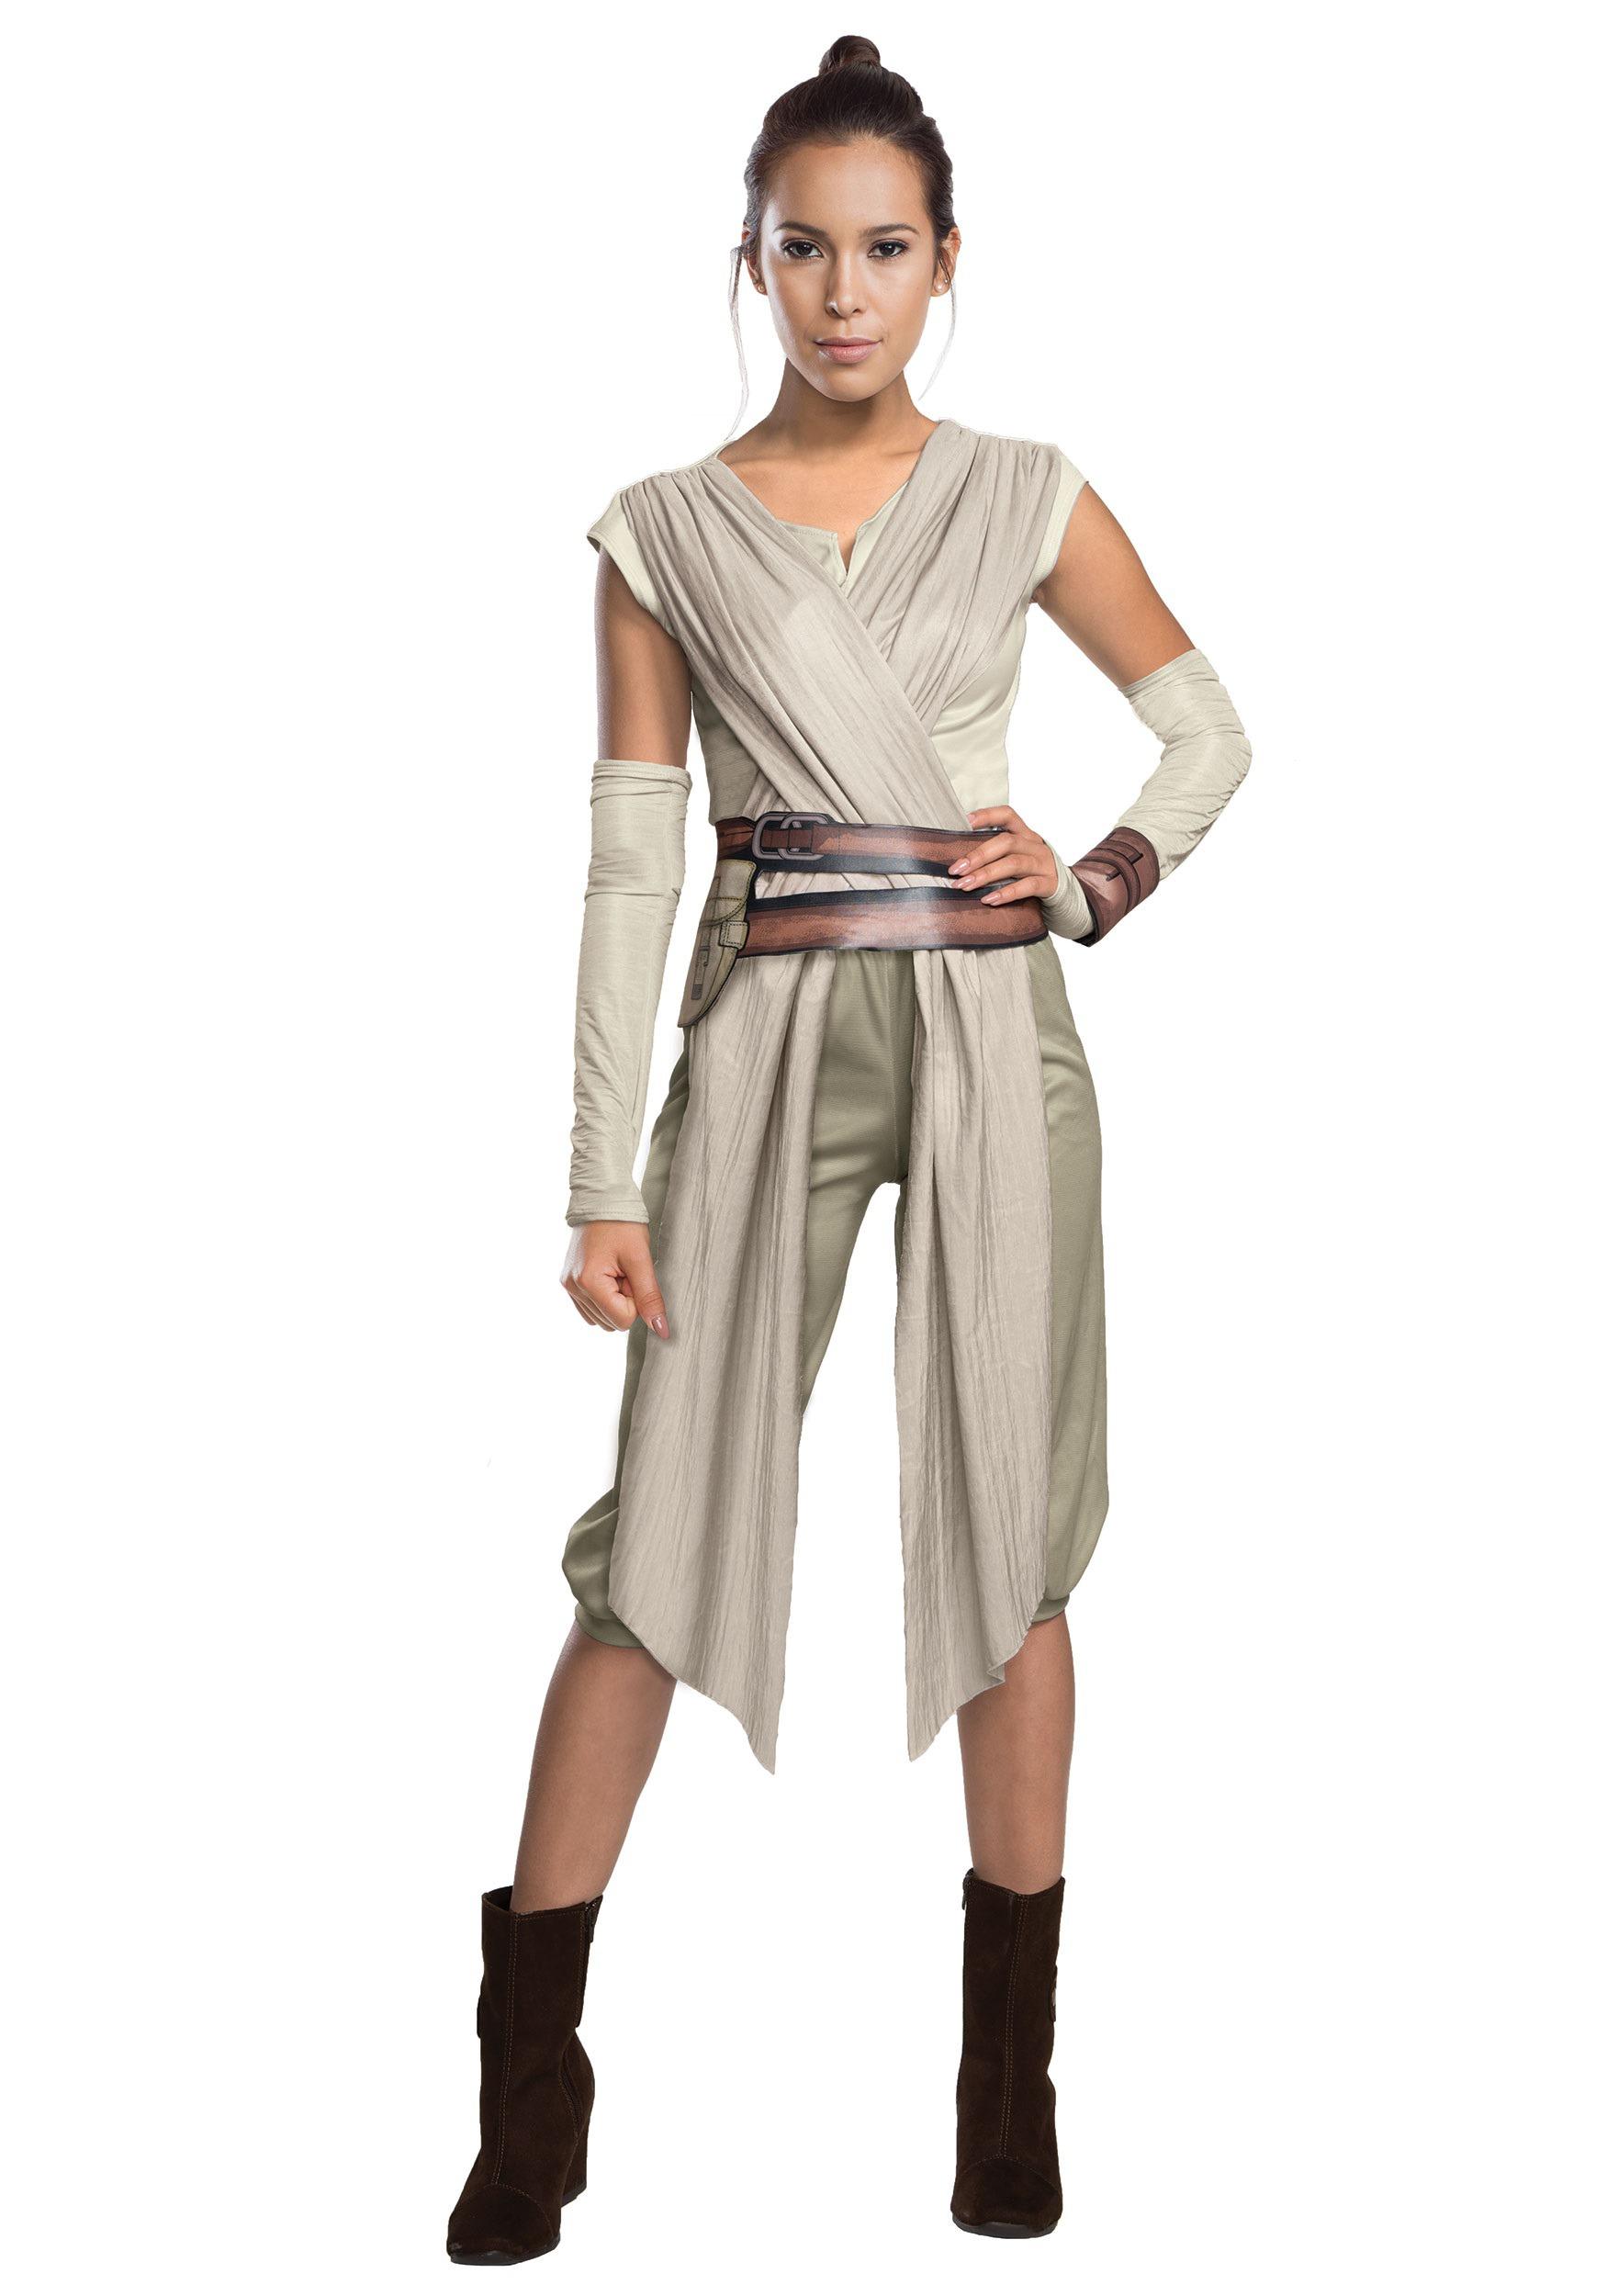 Deluxe Star Wars The Force Awakens Rey Costume for Women